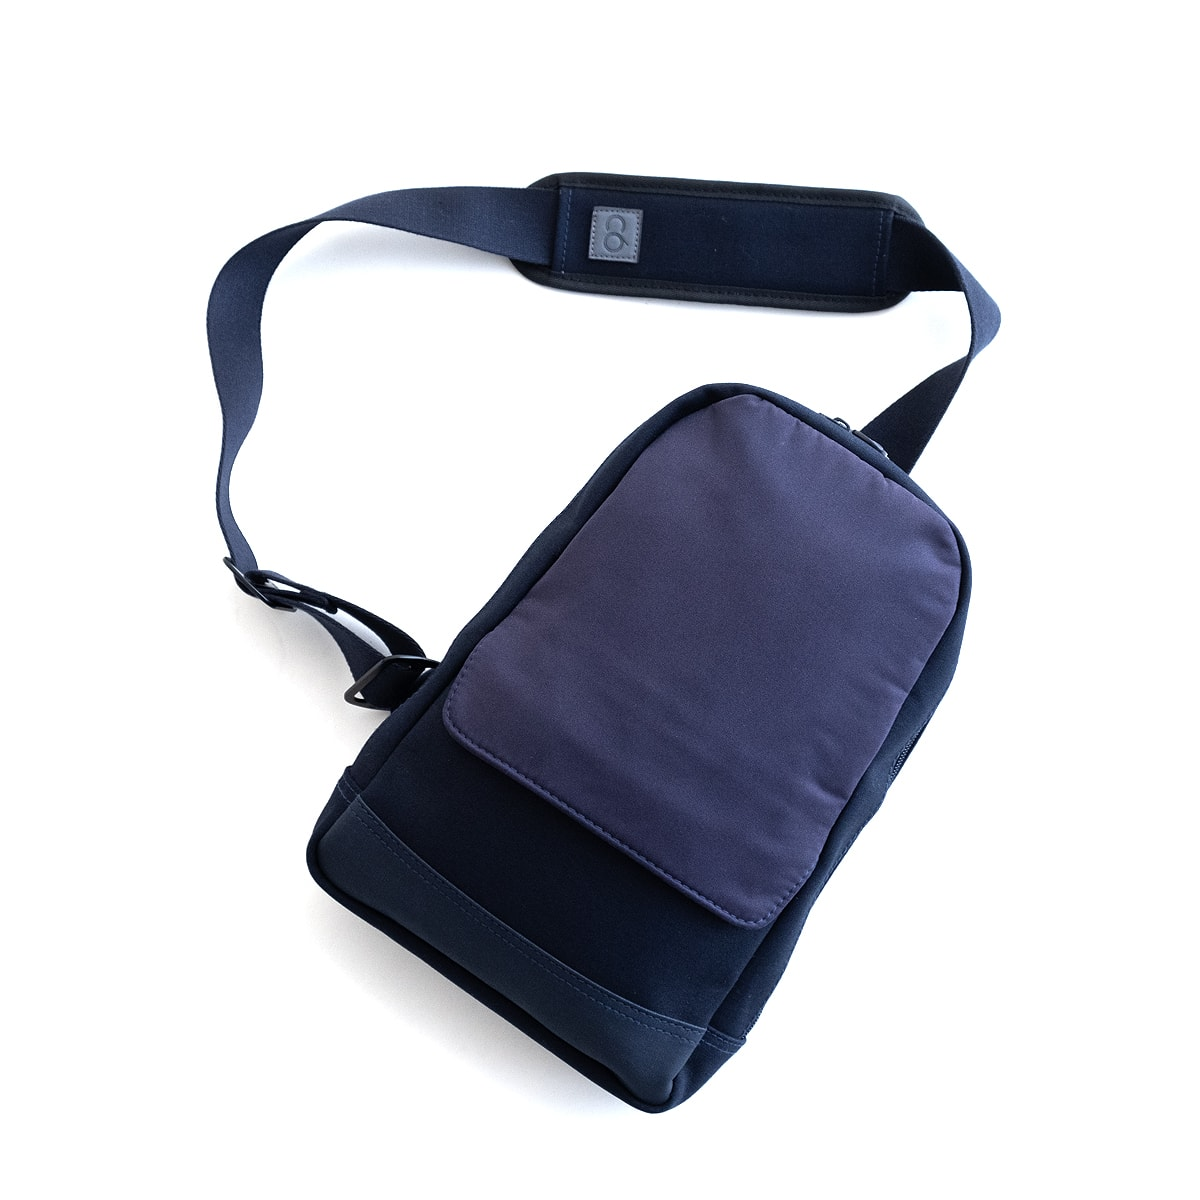 C6 Single Strap Backpack (Navy) C1710 シーシックス ストラップ バックパック ショルダーバッグ ナイロン コンパクト 軽量 バッグ ユニセックス 男女兼用 メンズ 送料無料